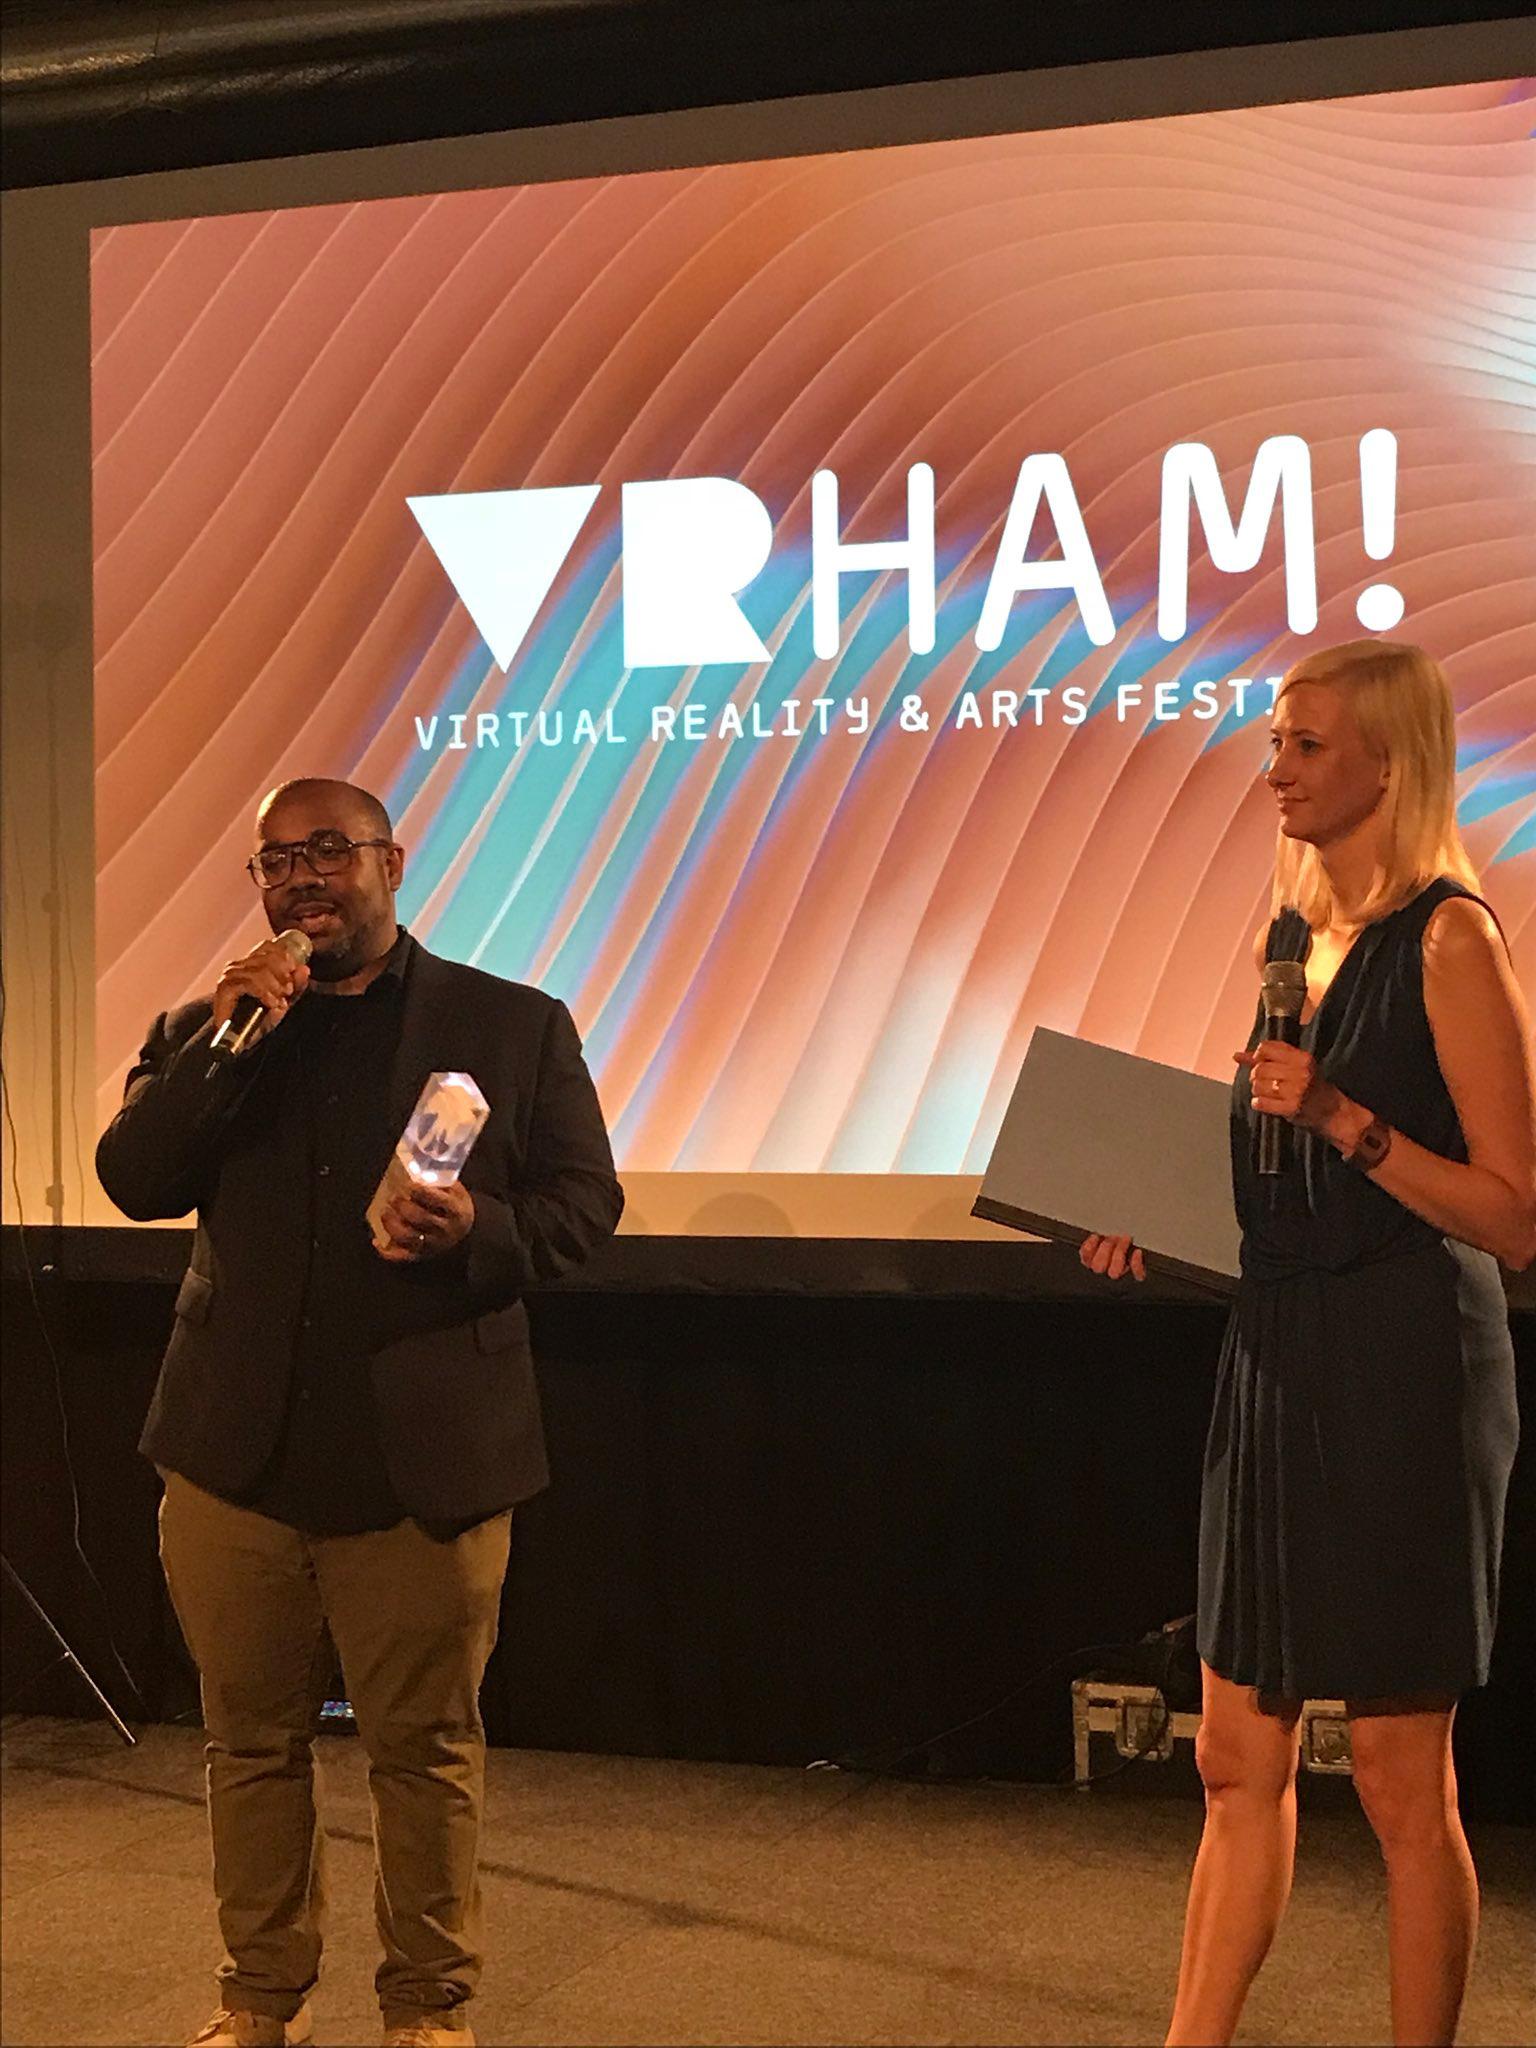 VRHAM Corporate Identity